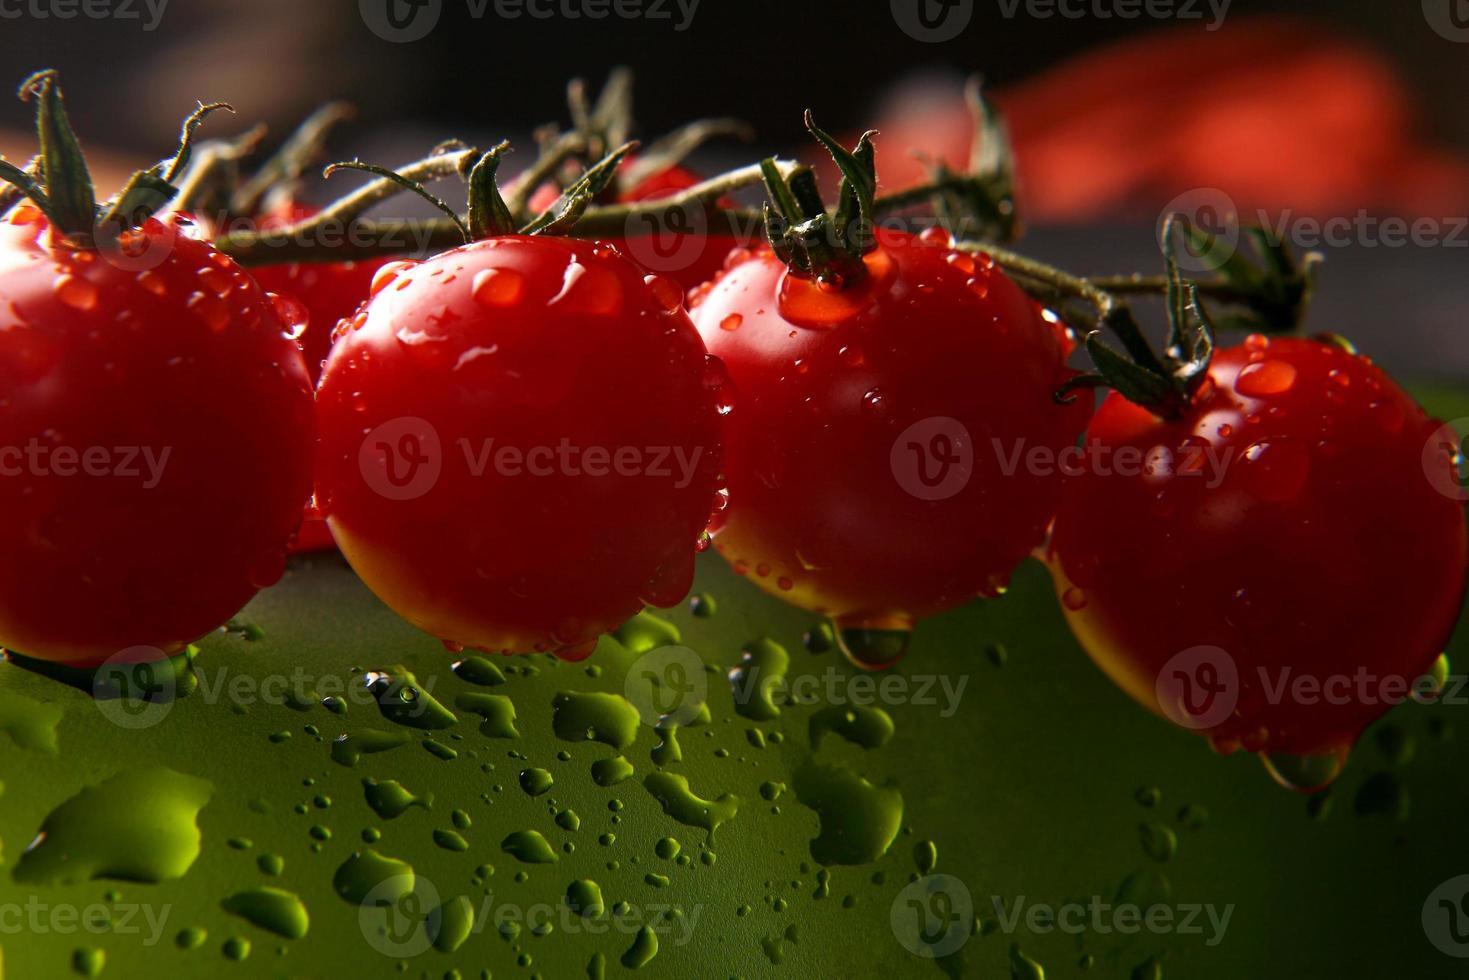 tomater i vattendropparna på grön bakgrund foto